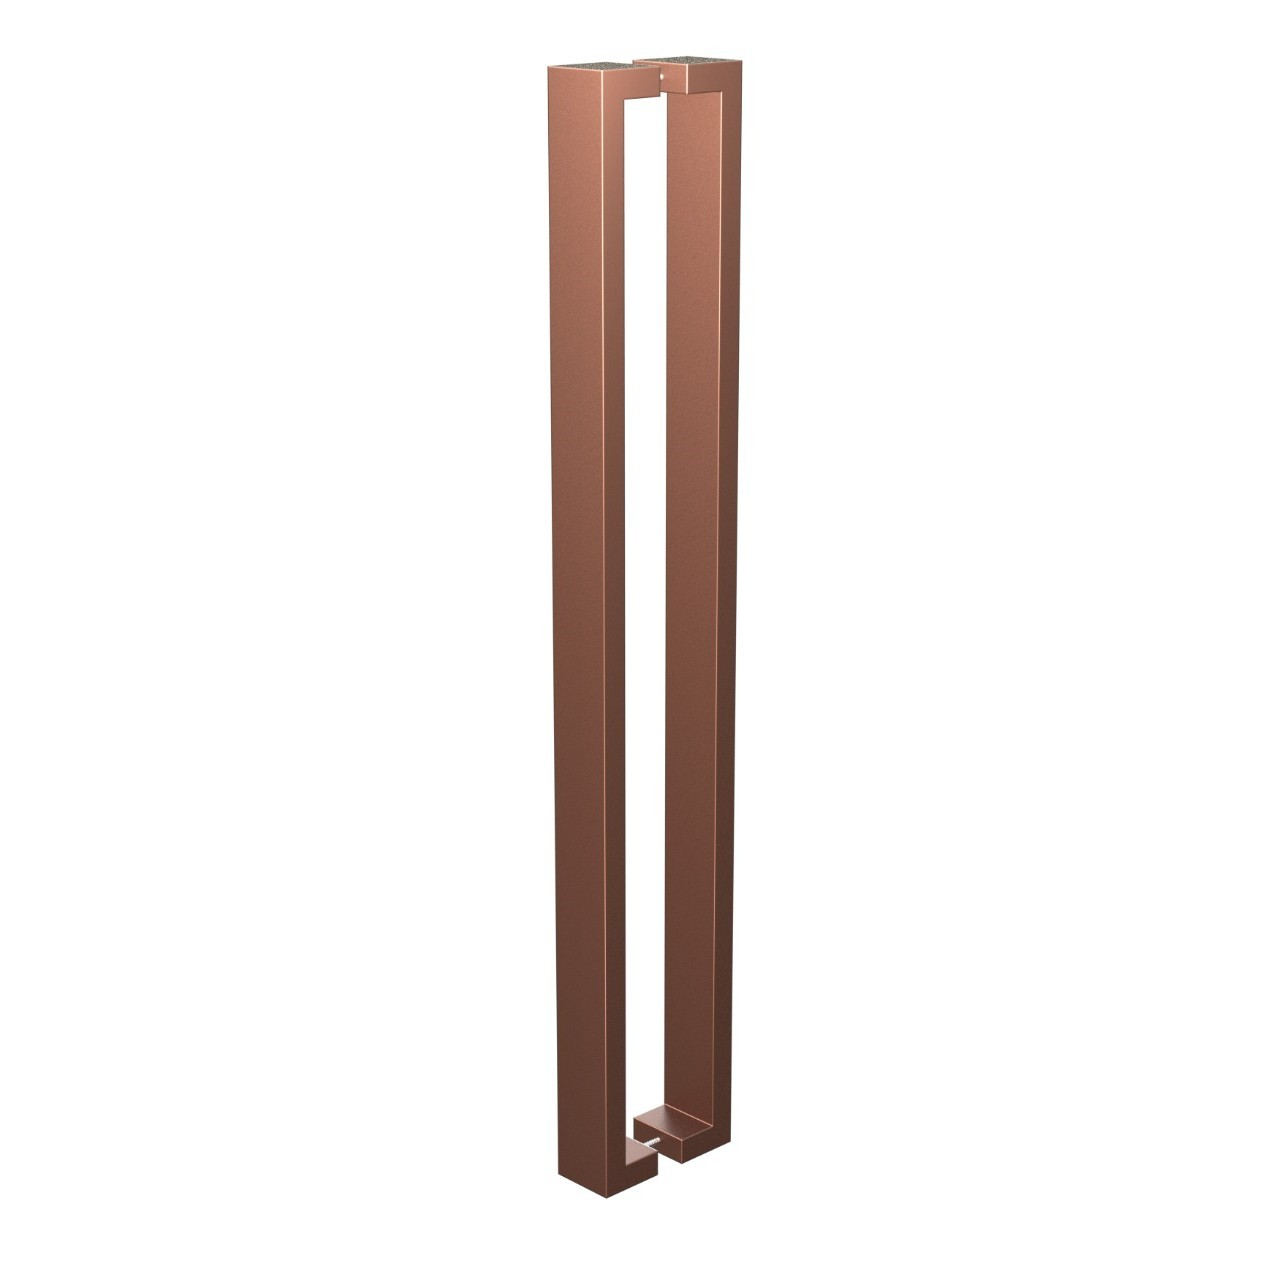 Puxador de Portas Sobrepor Aco Inox 101cm 1 par Leblon Bronze - Acobrasil